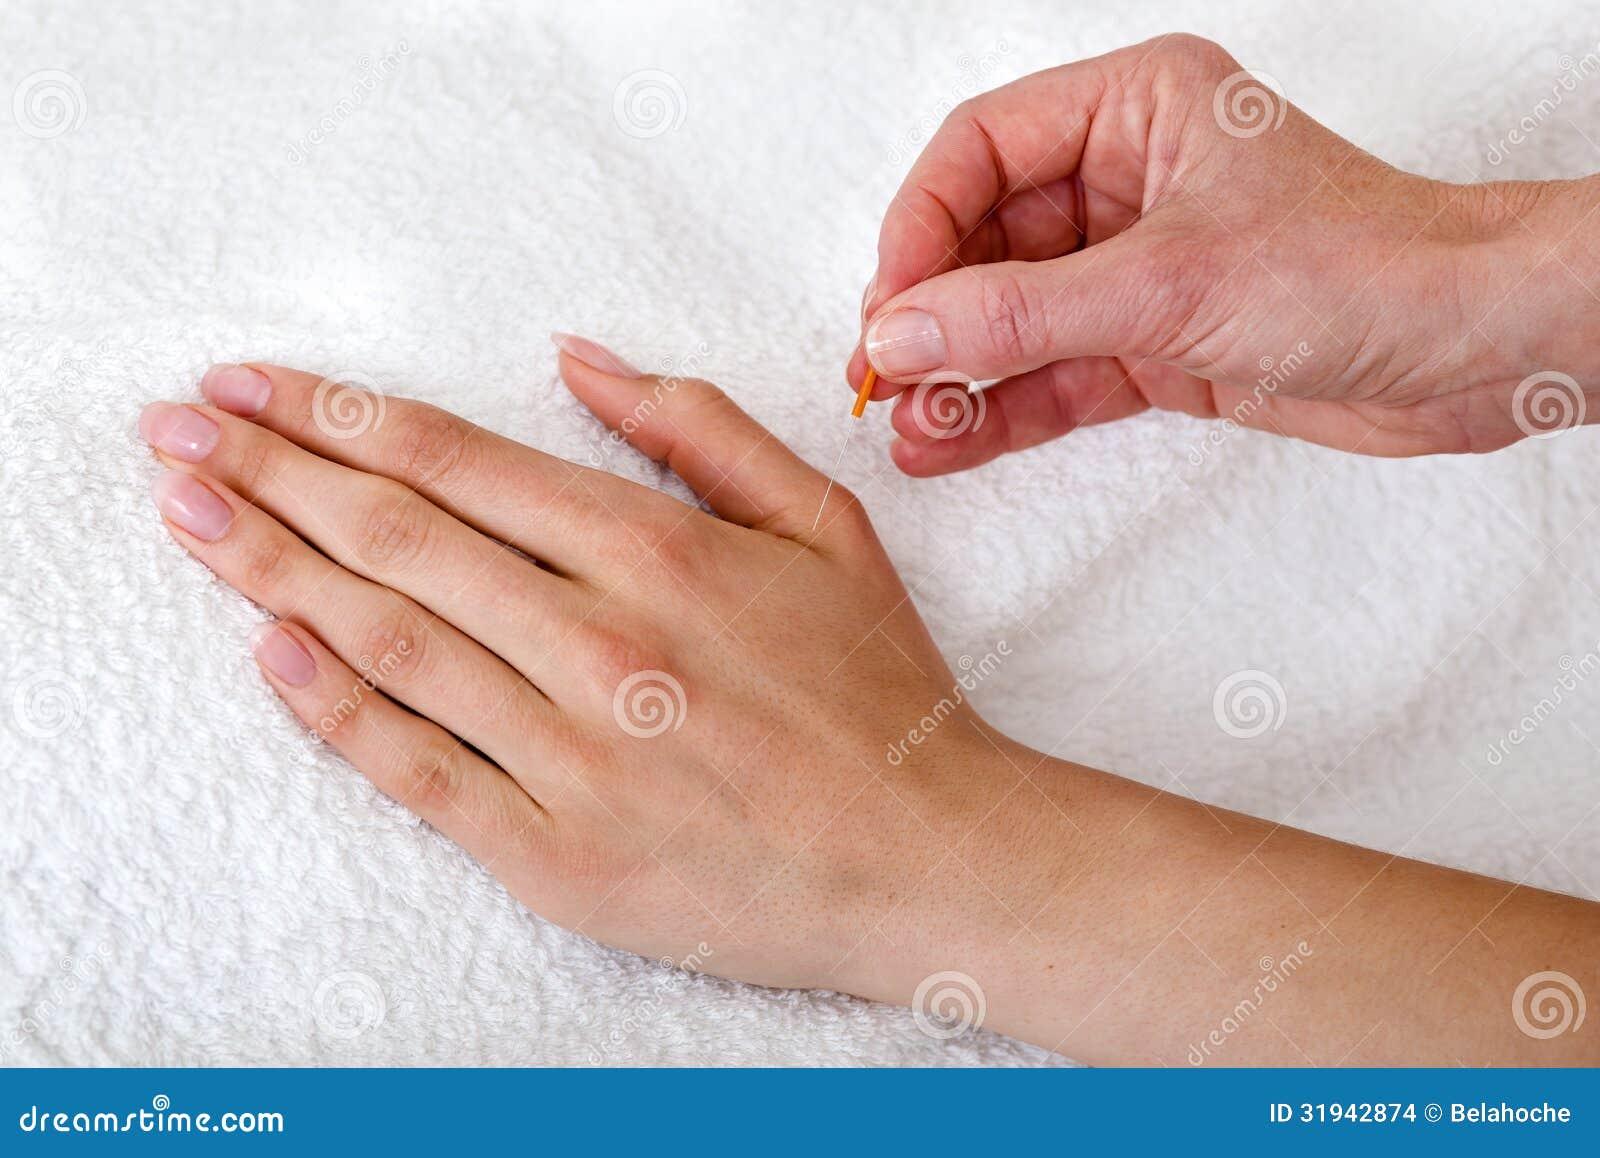 Alternative Practitioner Applying Acupuncture Needles